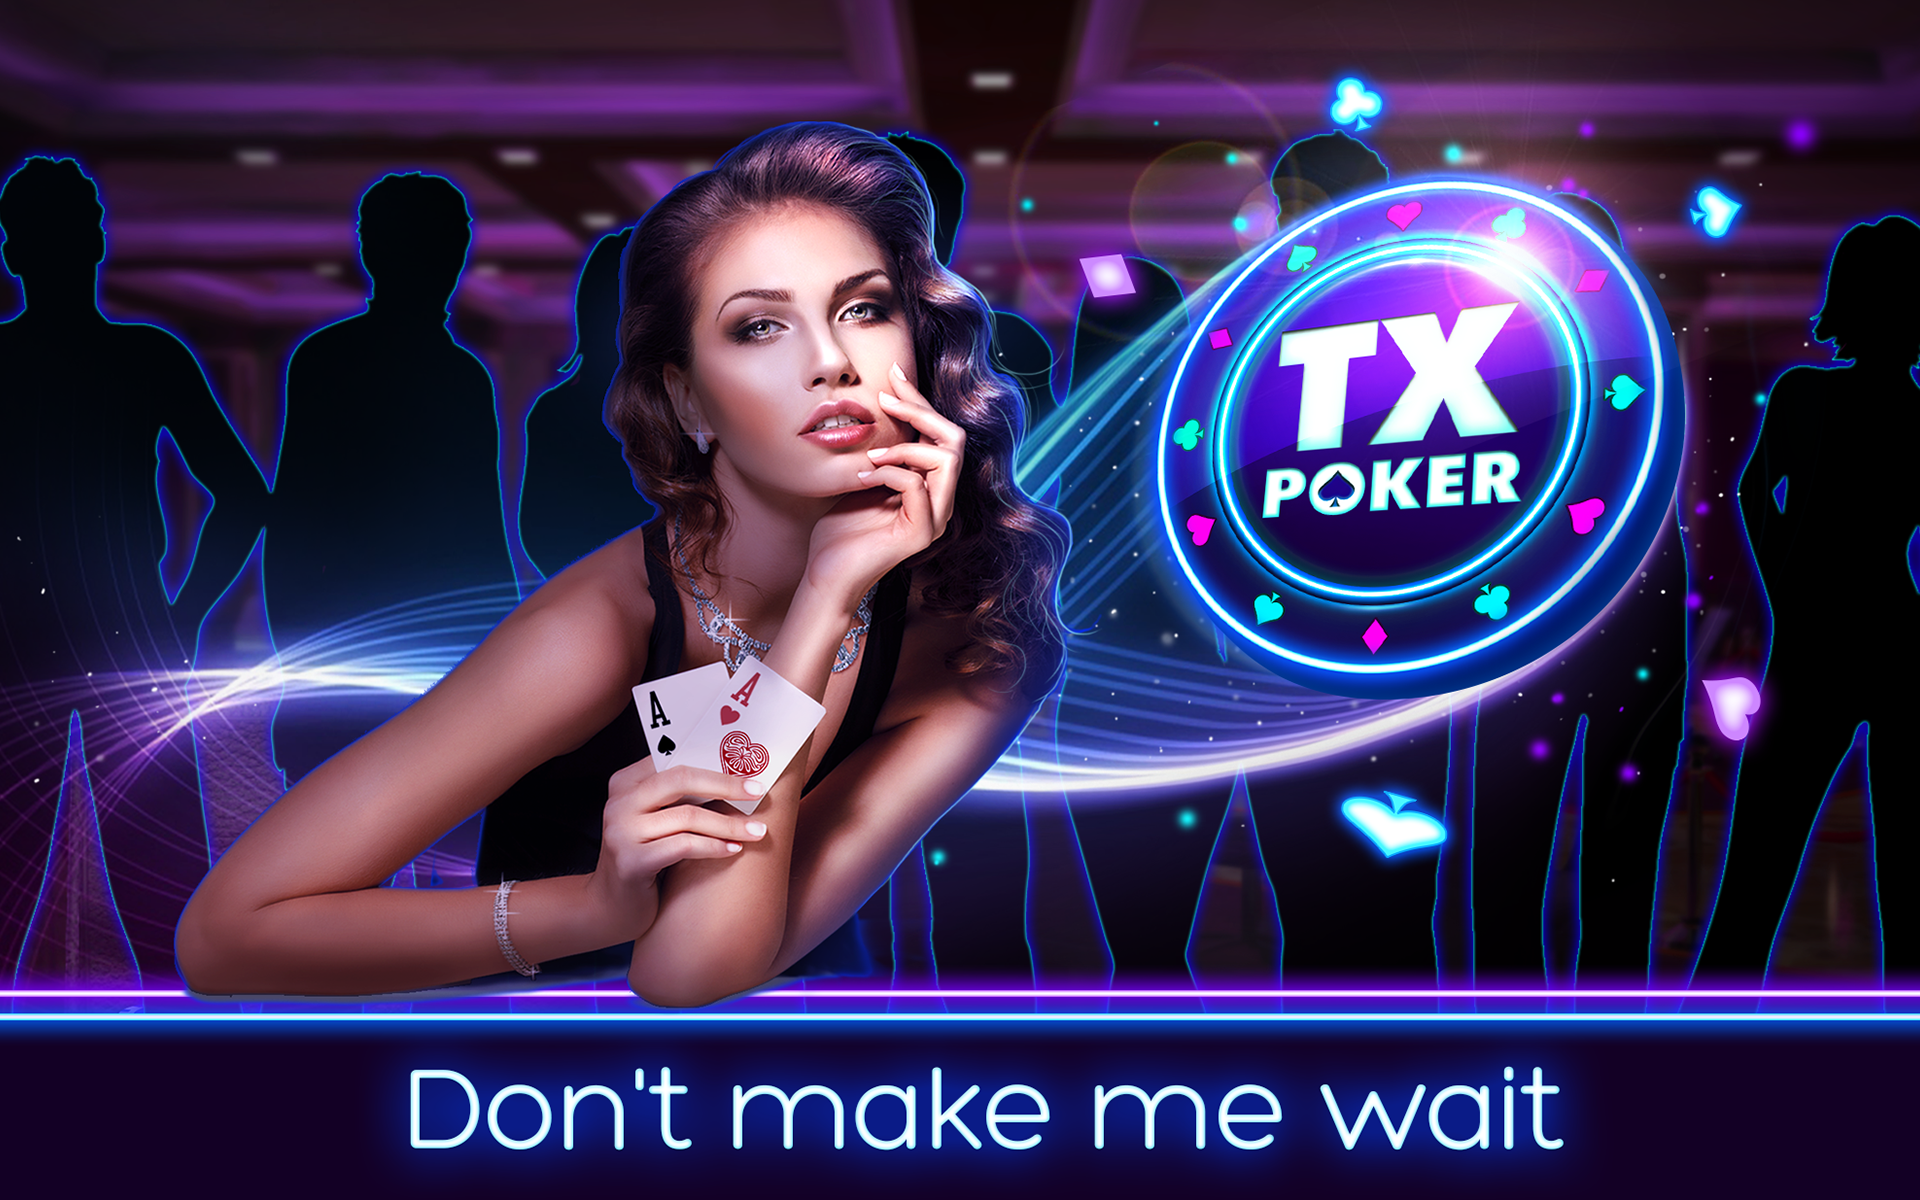 tx poker